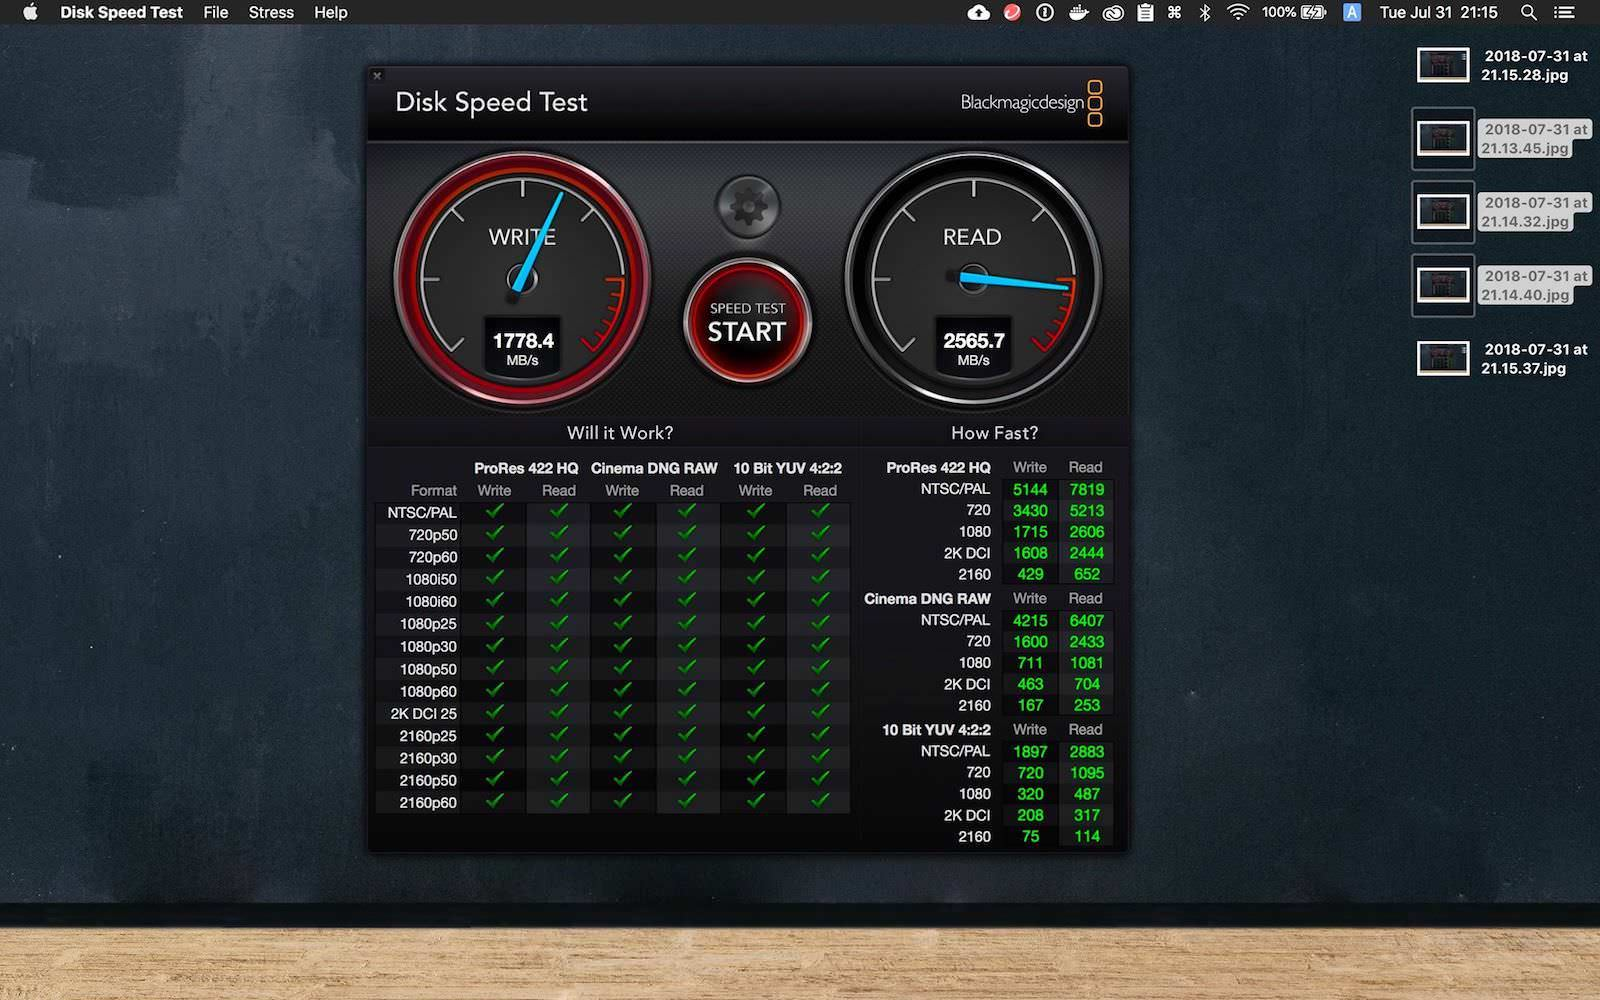 Disk-Speed-Test-Youtachannel.jpg